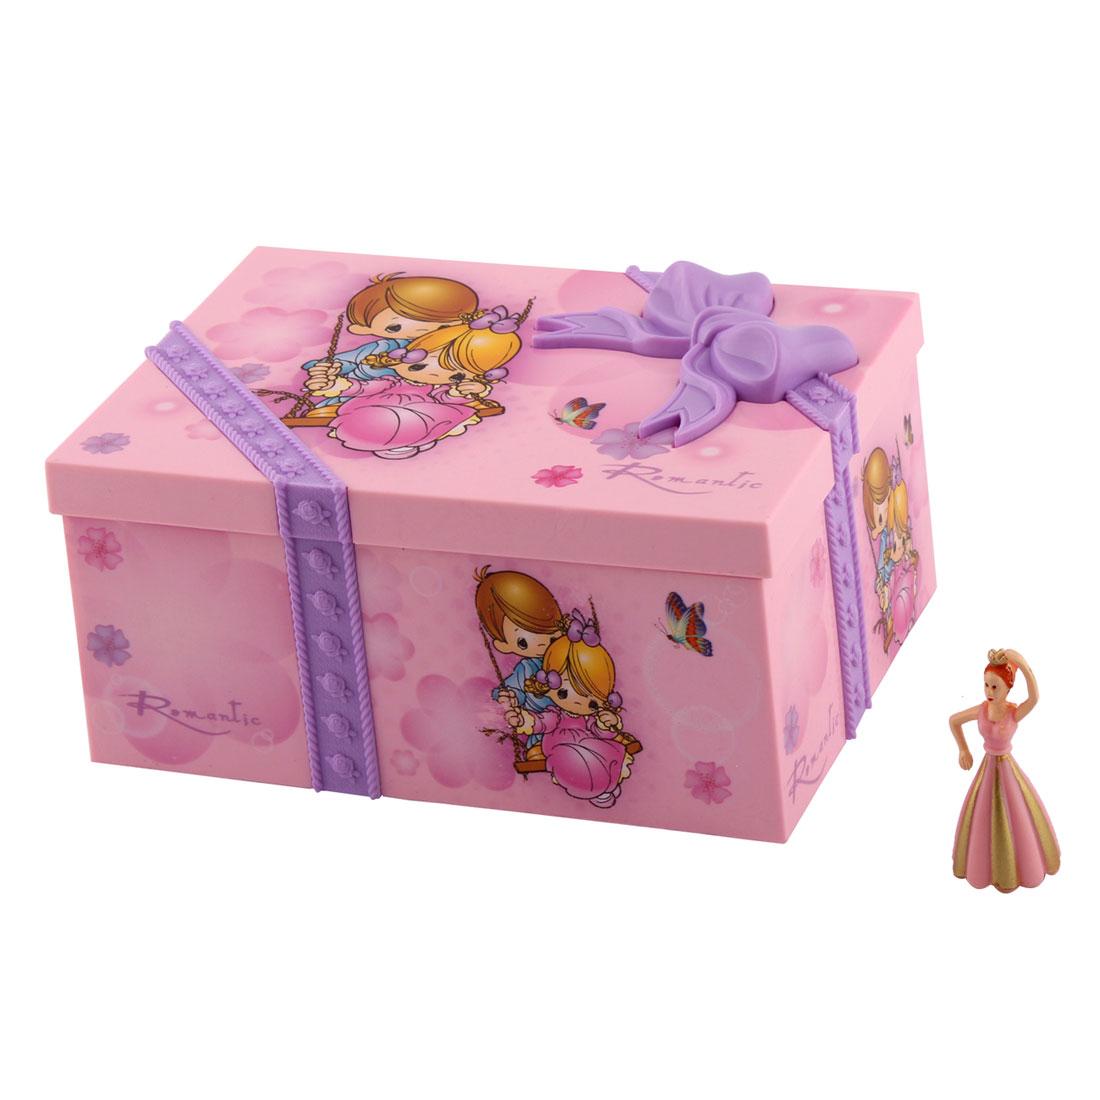 Home Plastic Musical Jewllery Box Case Holder Birthday Gift Pink